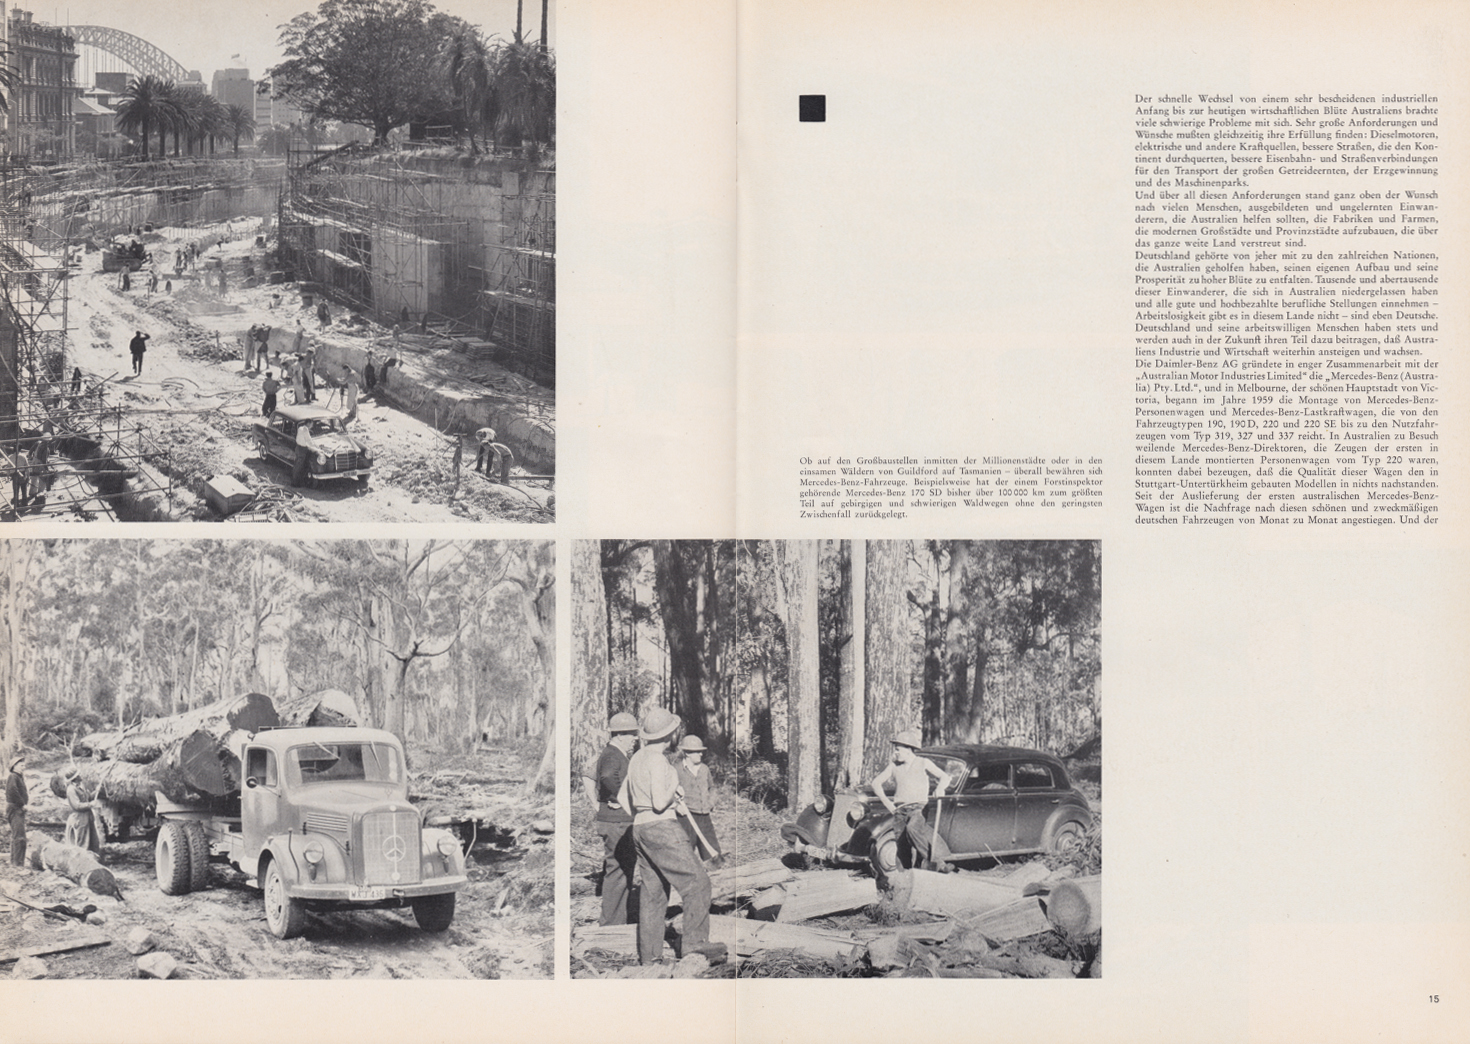 (REVISTA): Periódico In aller welt n.º 44 - Mercedes-Benz no mundo - 1960 - multilingue 008